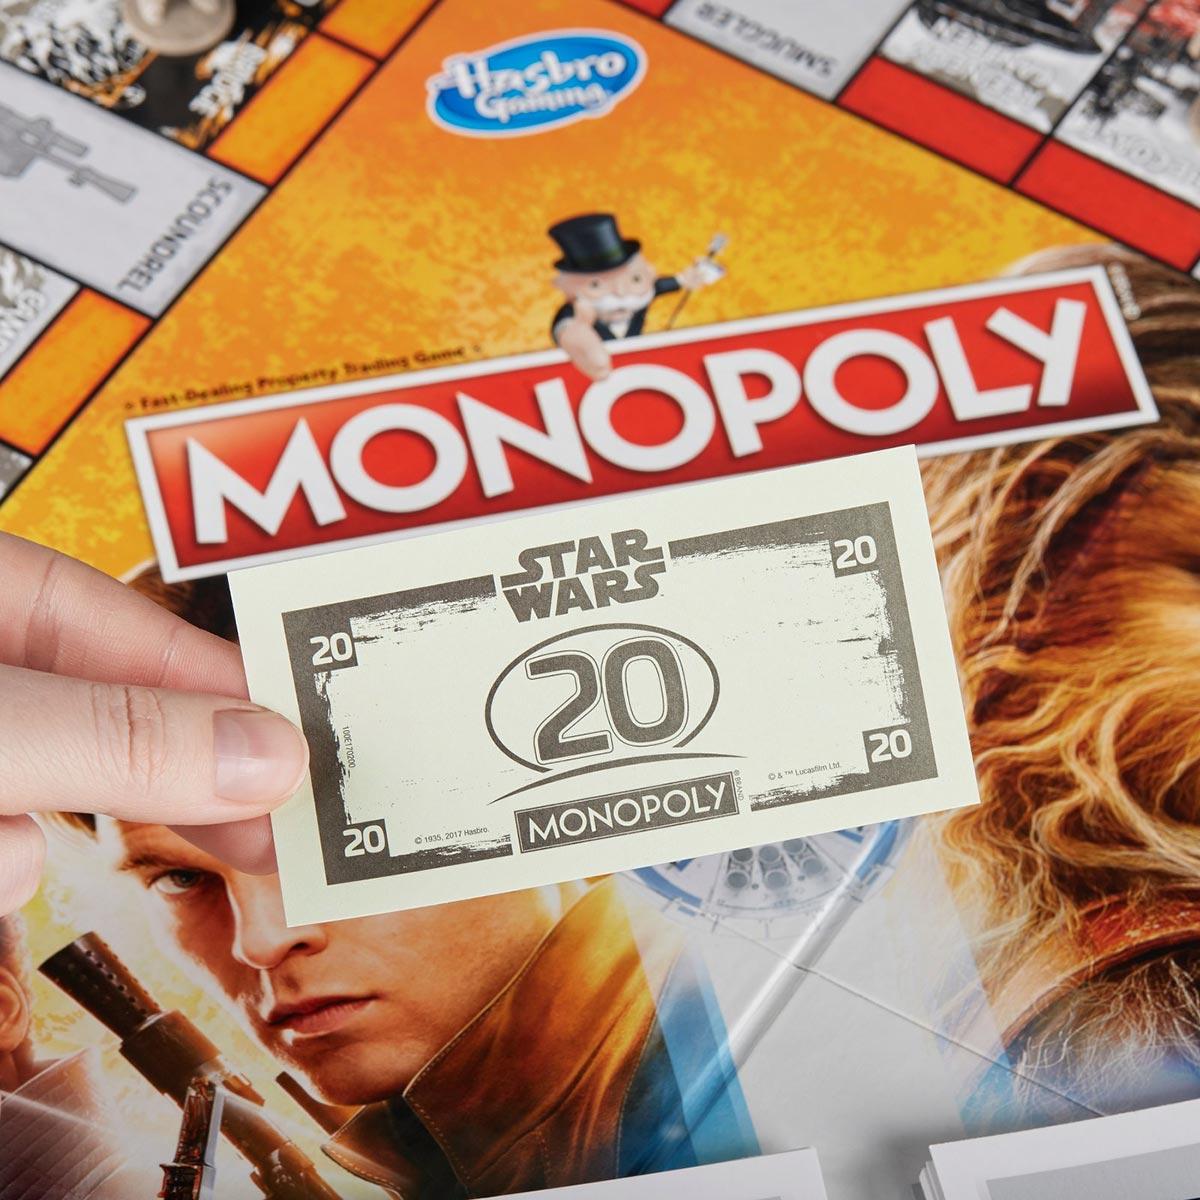 Monopoly Star Wars Han Solo